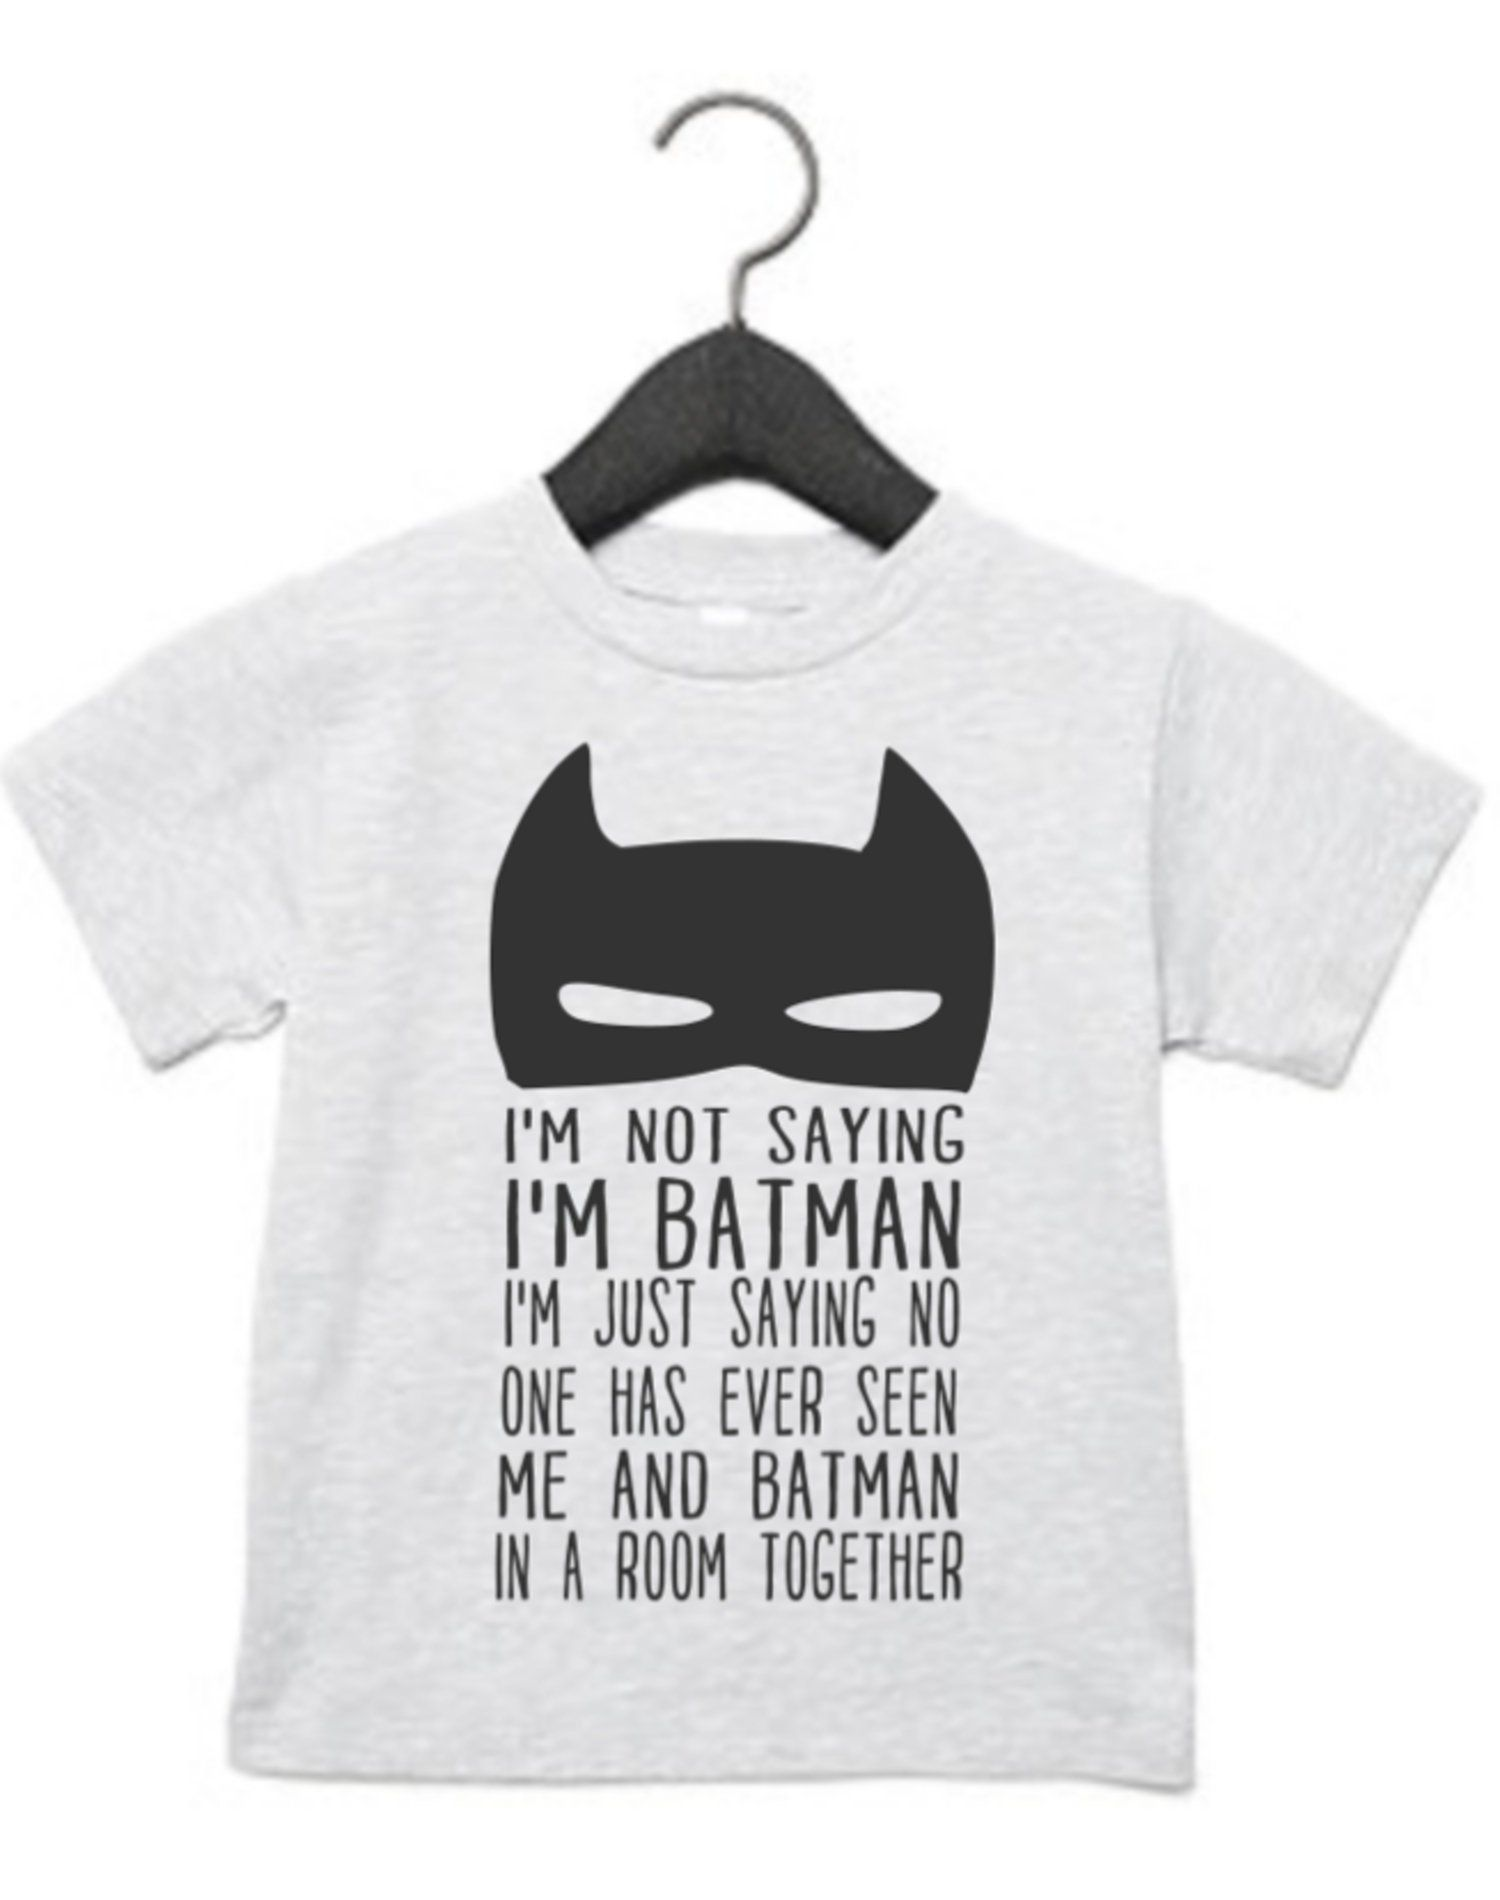 3a8d731be Batman Humor Kids Shirt | The Tattered Sparrow | Kids shirts, Shirts ...